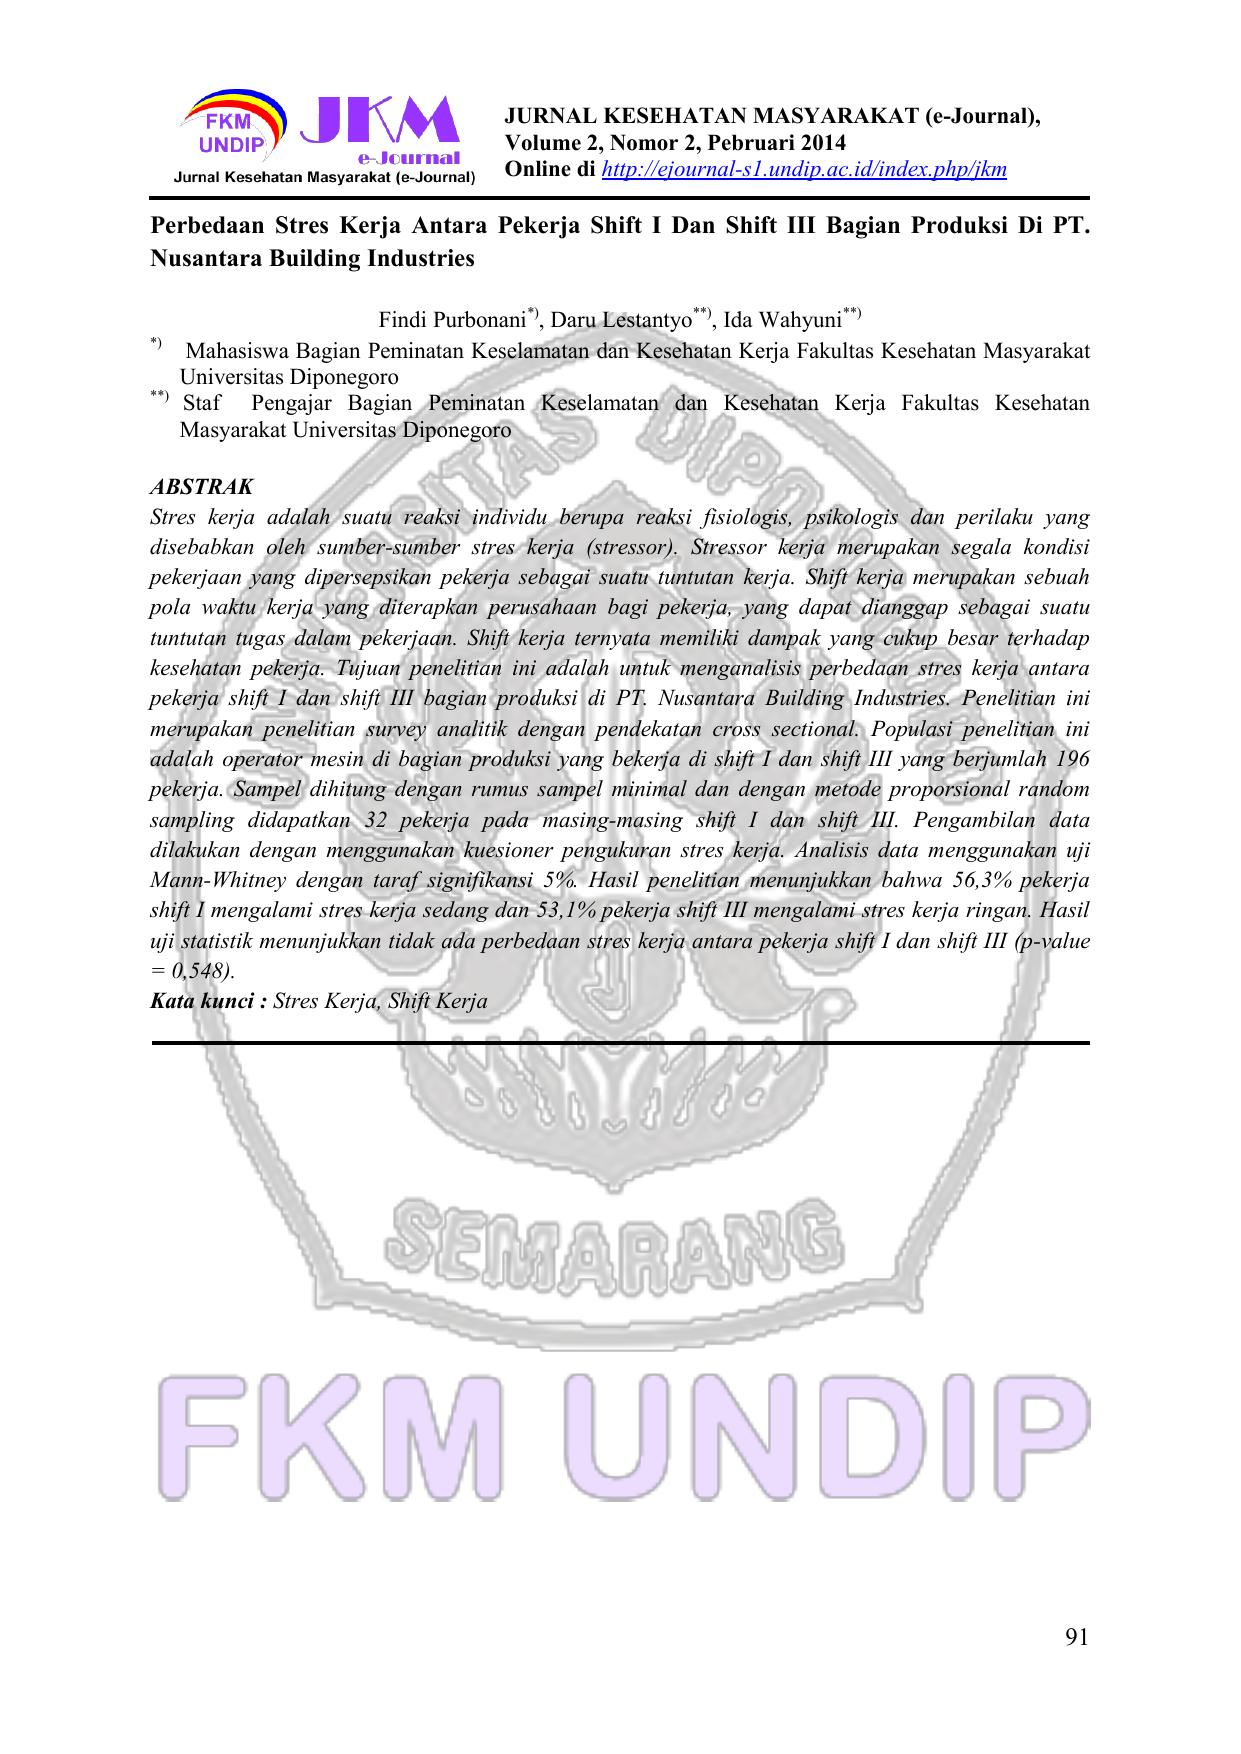 Indeks Manajemen Psikologi Industri Minto Waluyo - Daftar Harga ... - Metode Penelitian Manajemen. Source · 91 .